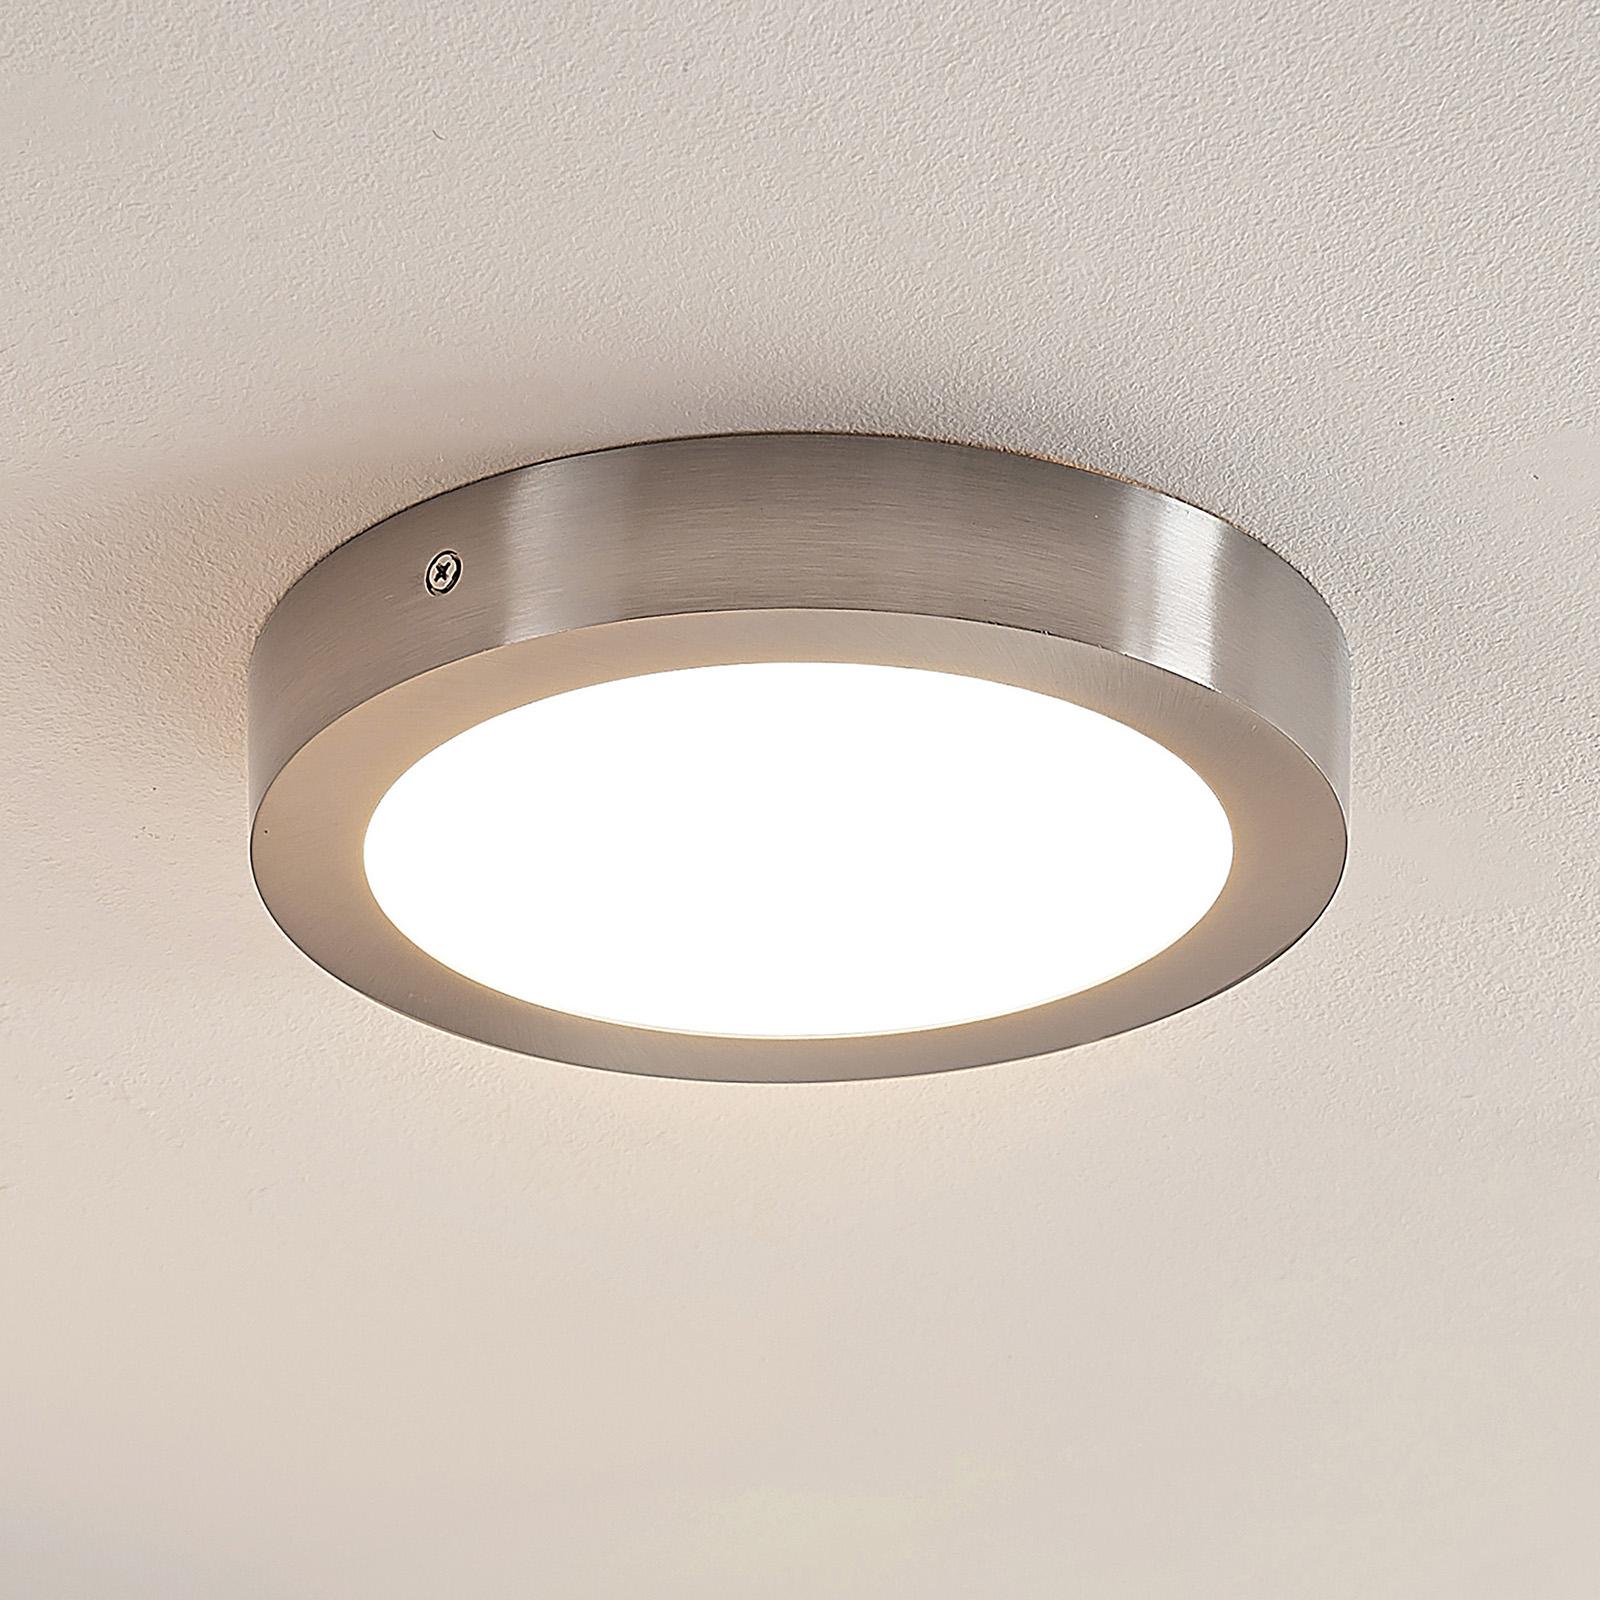 ELC Merina LED plafondlamp nikkel, 21,5cm